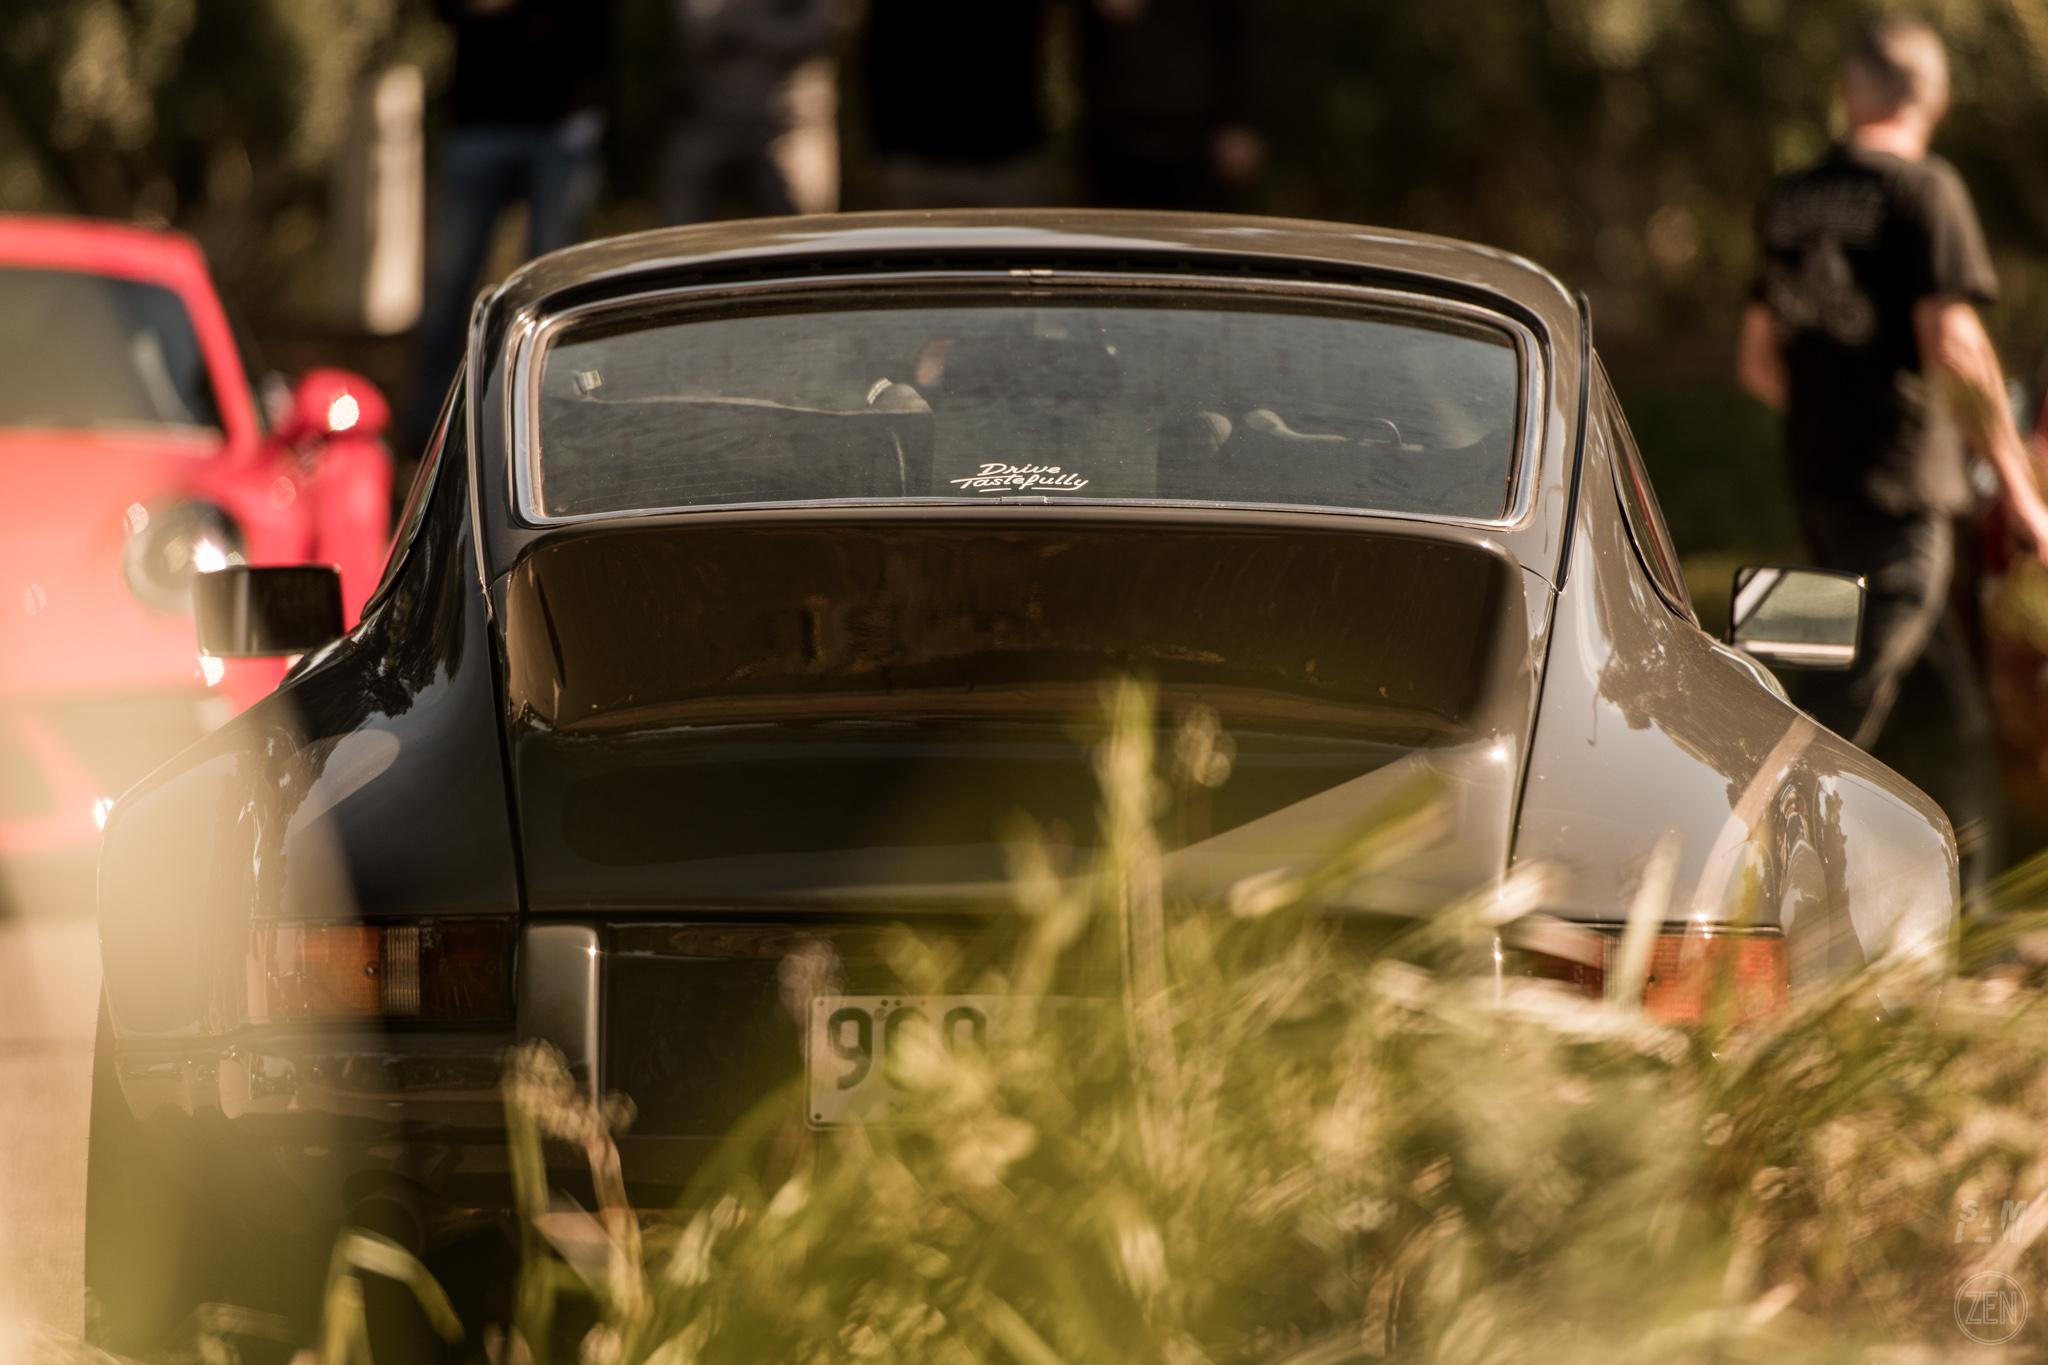 2019-10-27 - Autohaus Porsches & Coffee 173